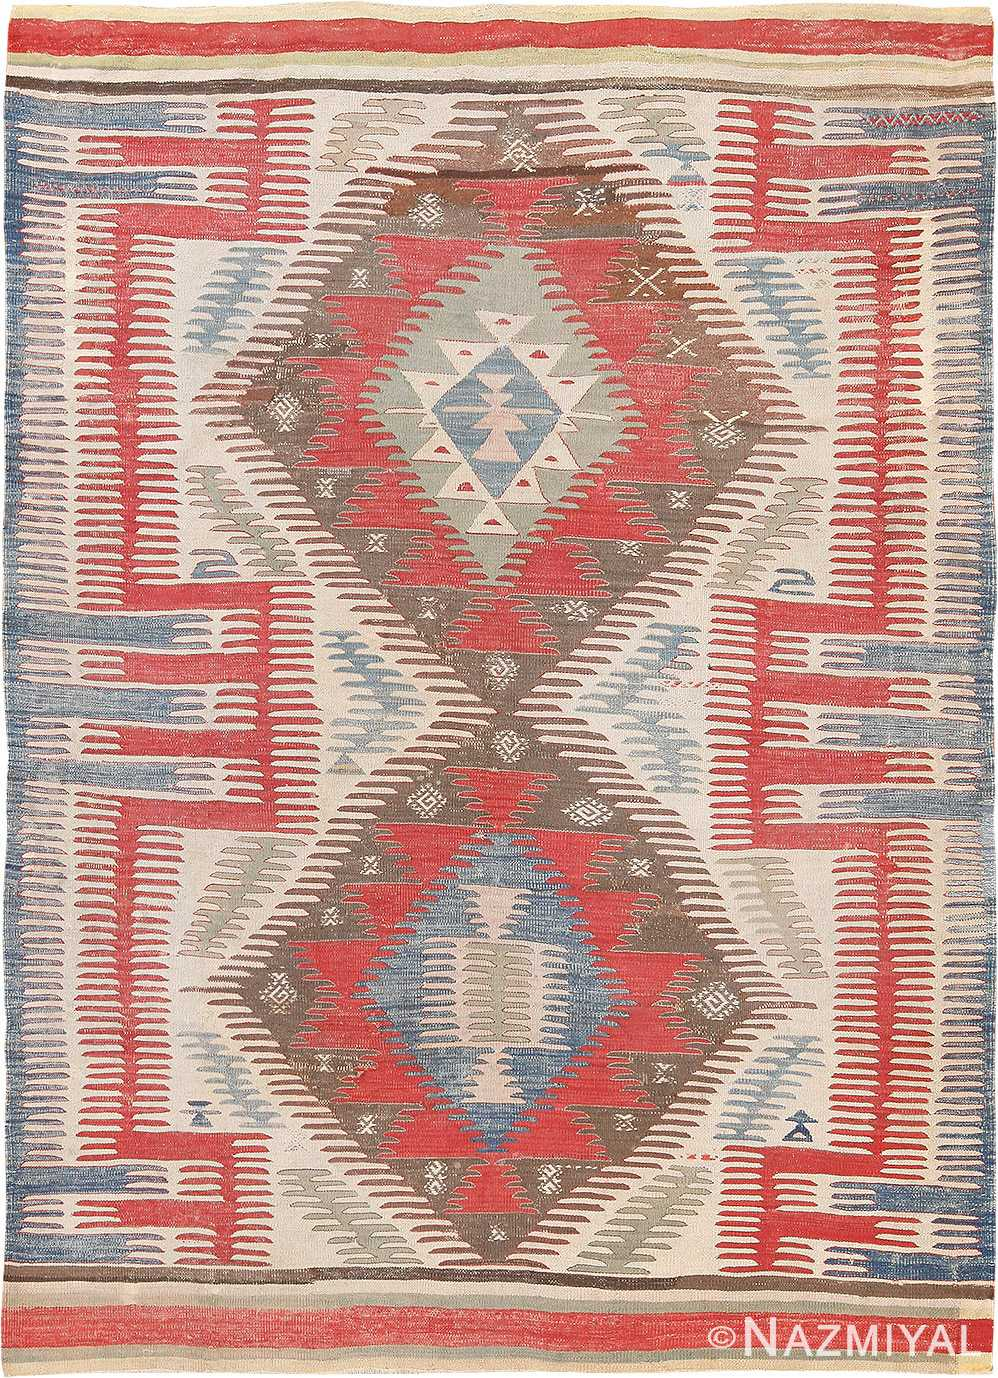 Tribal Antique Flat Weave Turkish Kilim 70009 Nazmiyal